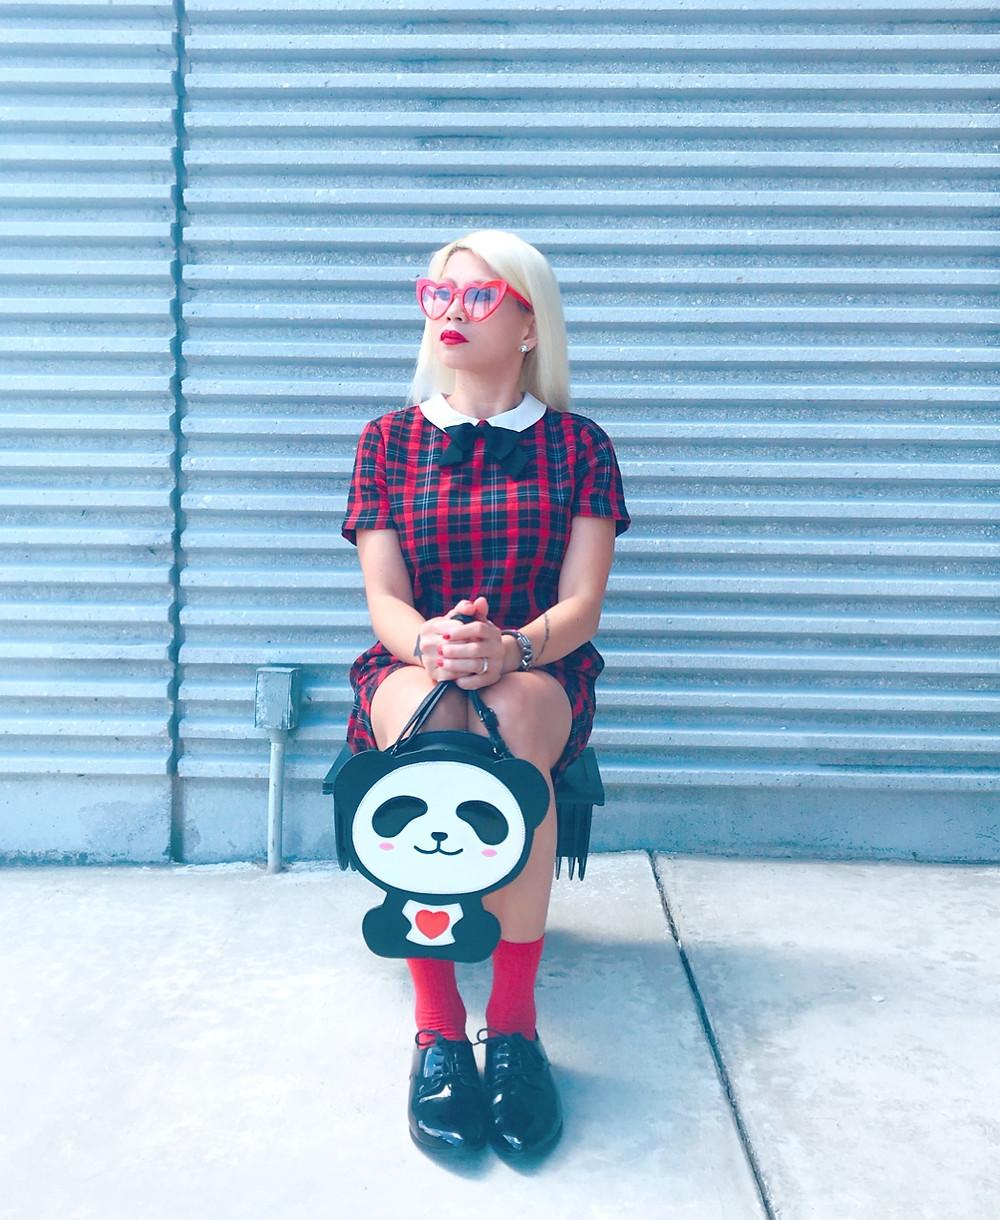 Bonjour! I am The Parisian Panda.